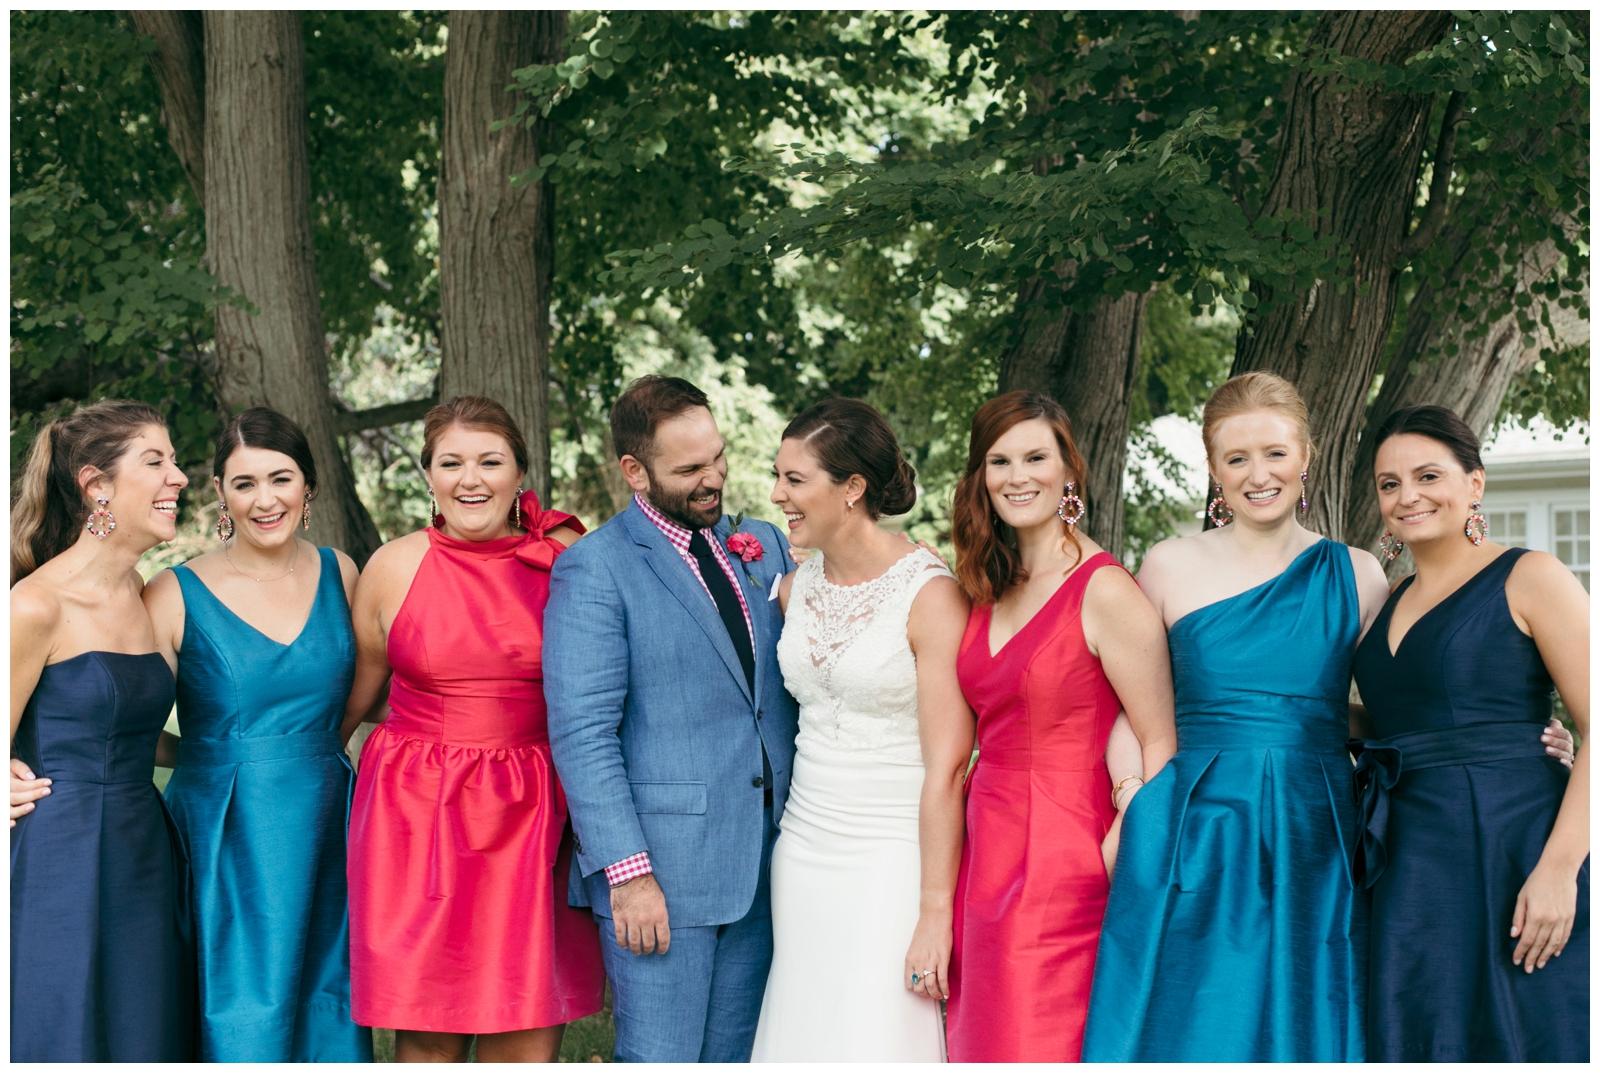 Bailey-Q-Photo-Backyard-Wedding-South-Shore-Boston-Wedding-Photographer-015.jpg